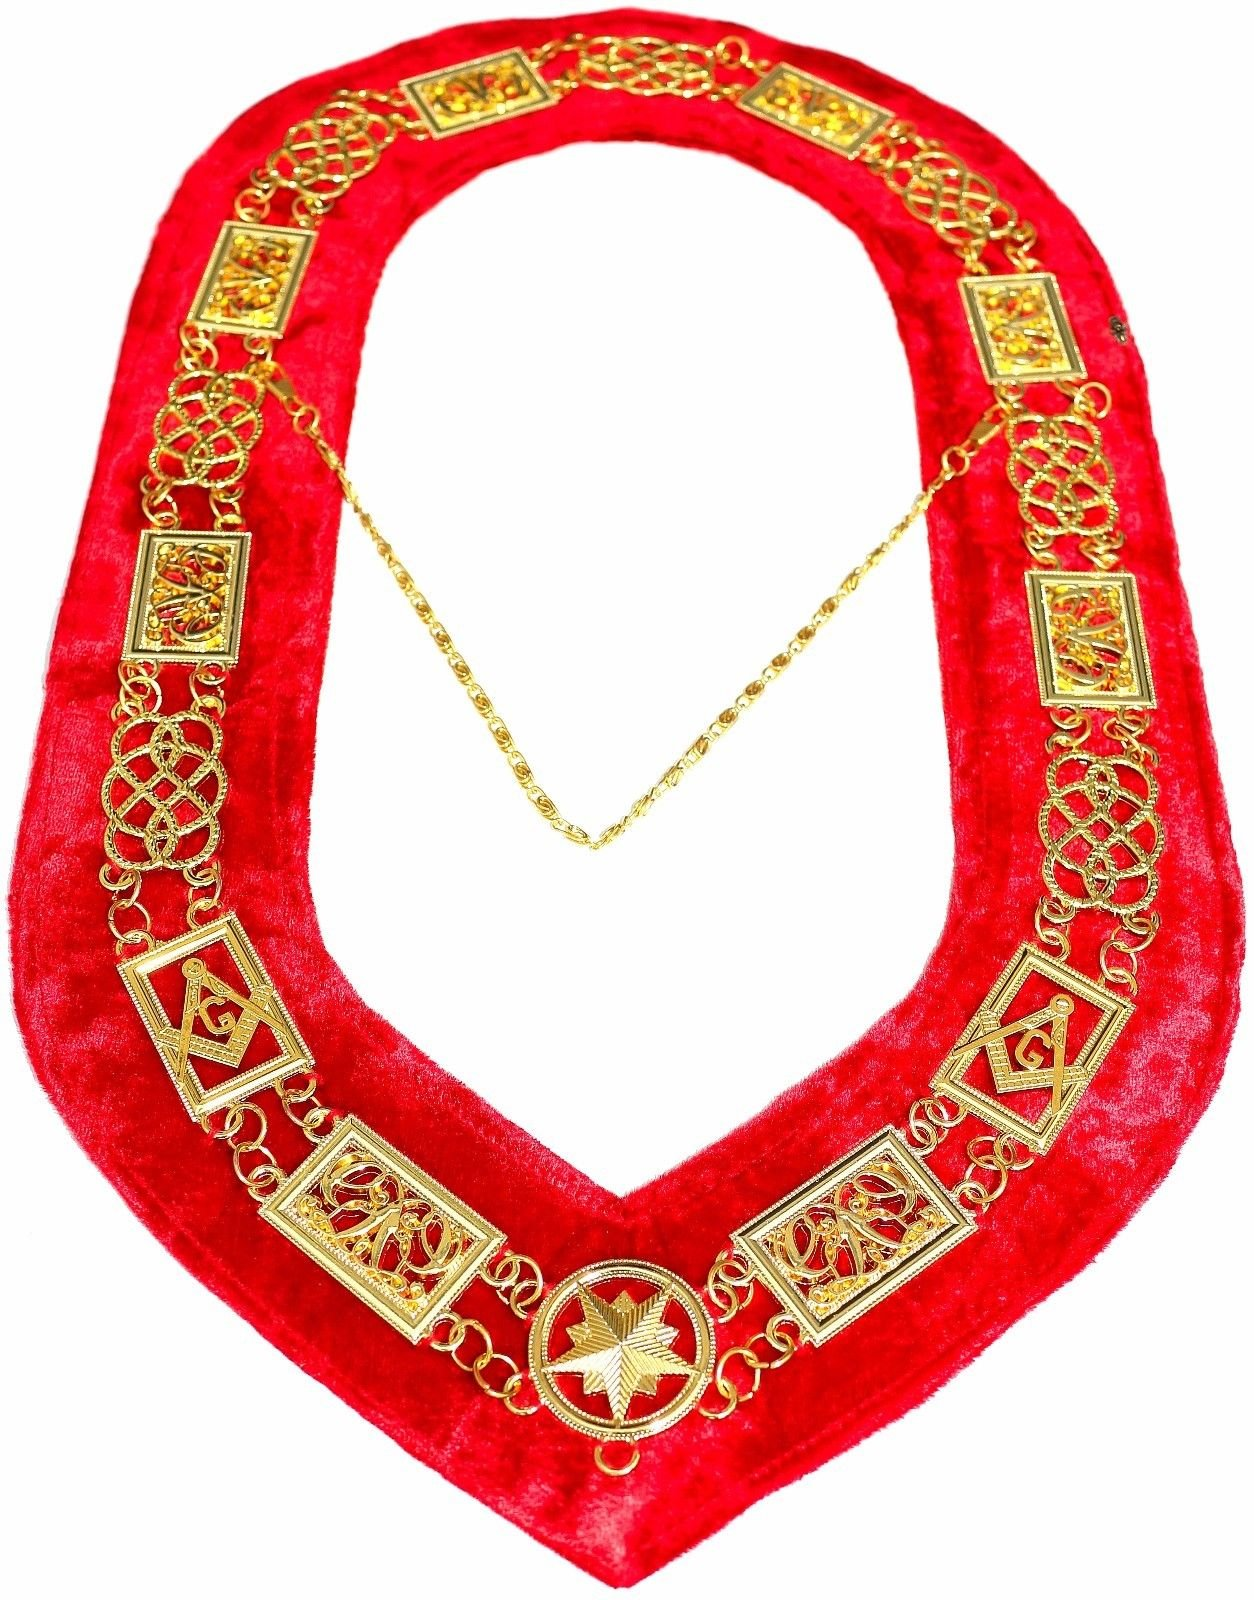 DEURA Masonic Collar FREEMASON Grand Lodge Master Mason GOLD PLATED//RED VELVET BACKING DMR-100GR